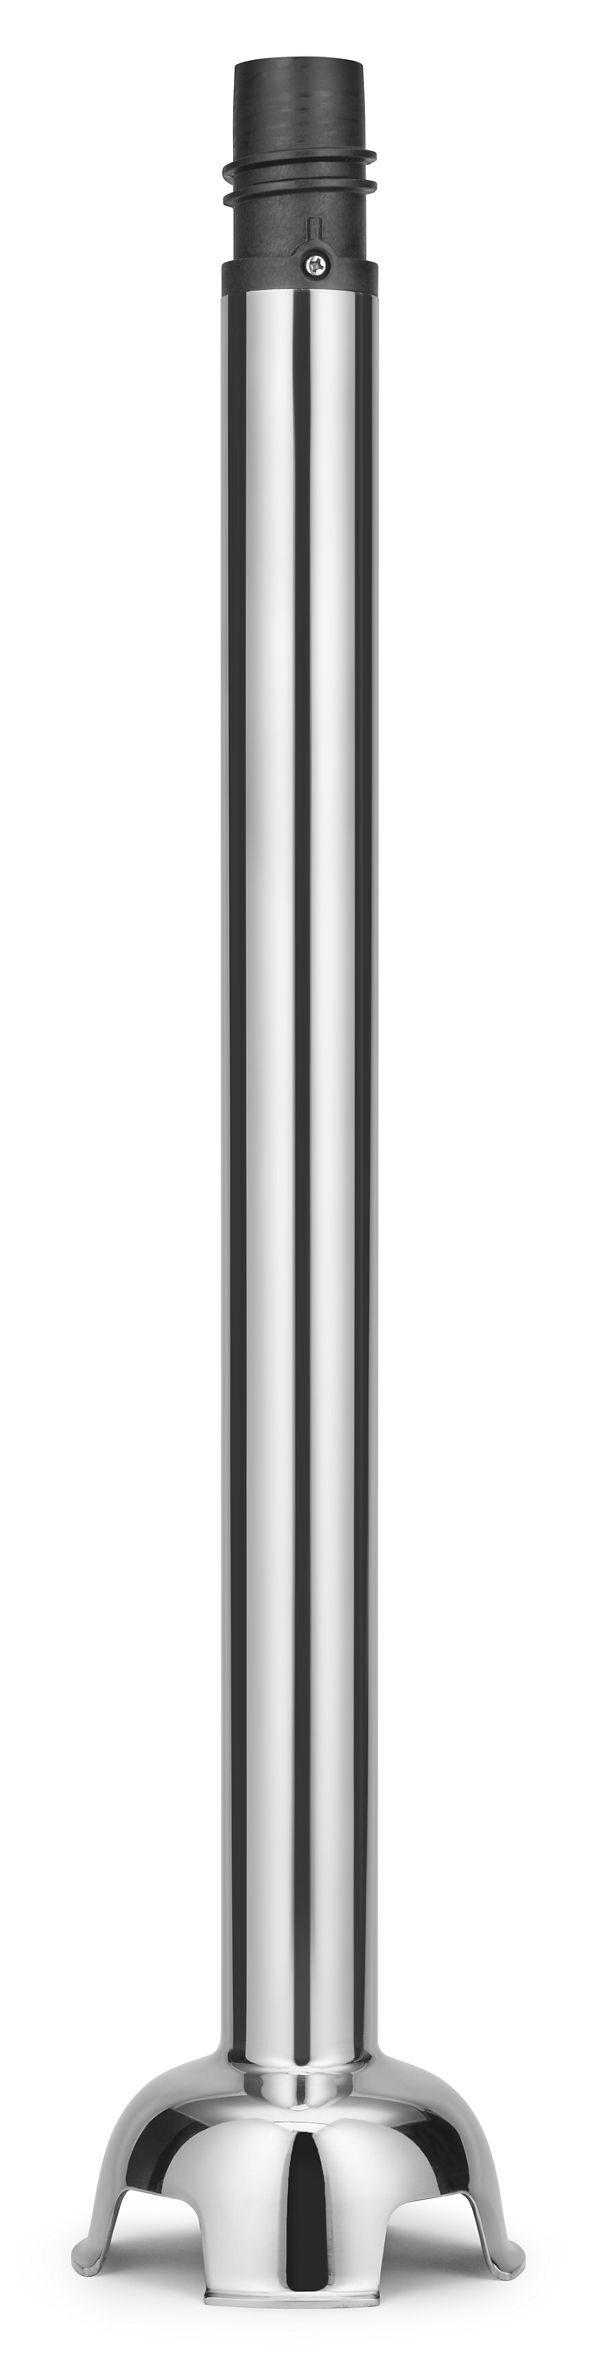 "KitchenAid 20"" Blending Arm For Commercial® 400 Series Immersion Blender in Stainless Steel"